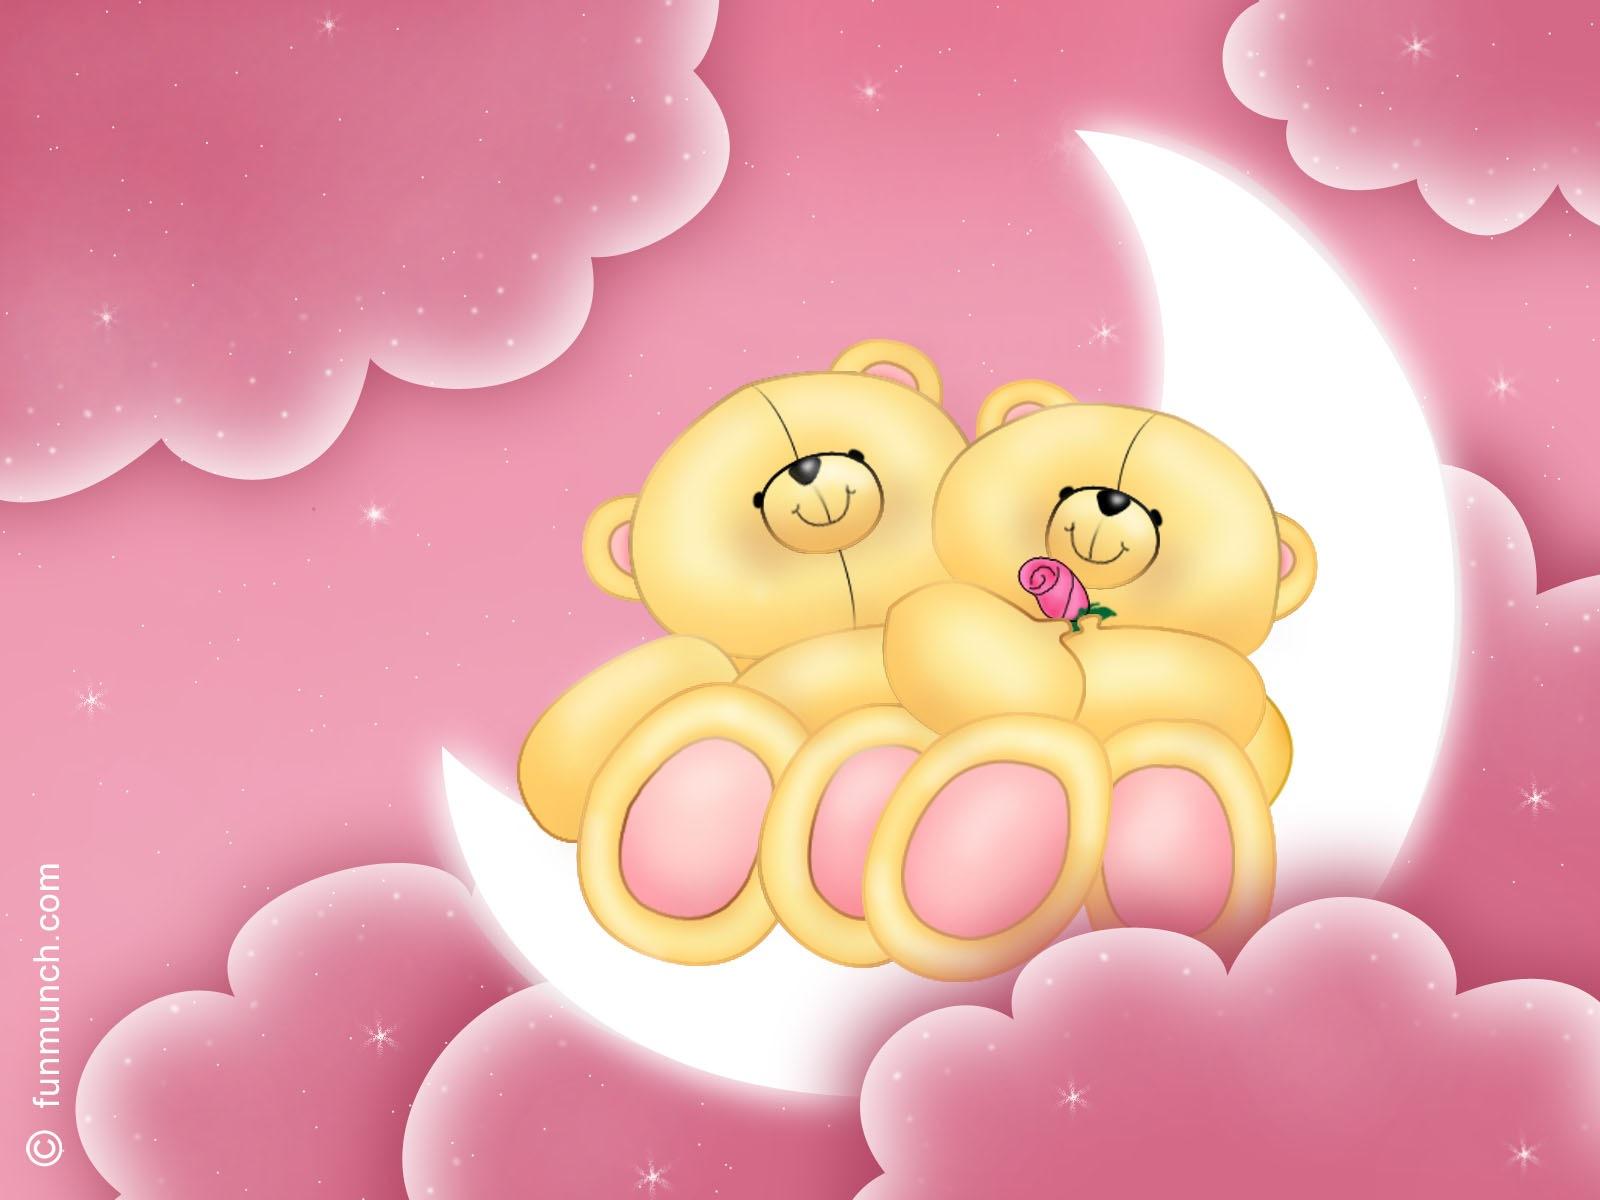 Lilli est friand de a blog of cute Forever Friends wallpaper 1600x1200